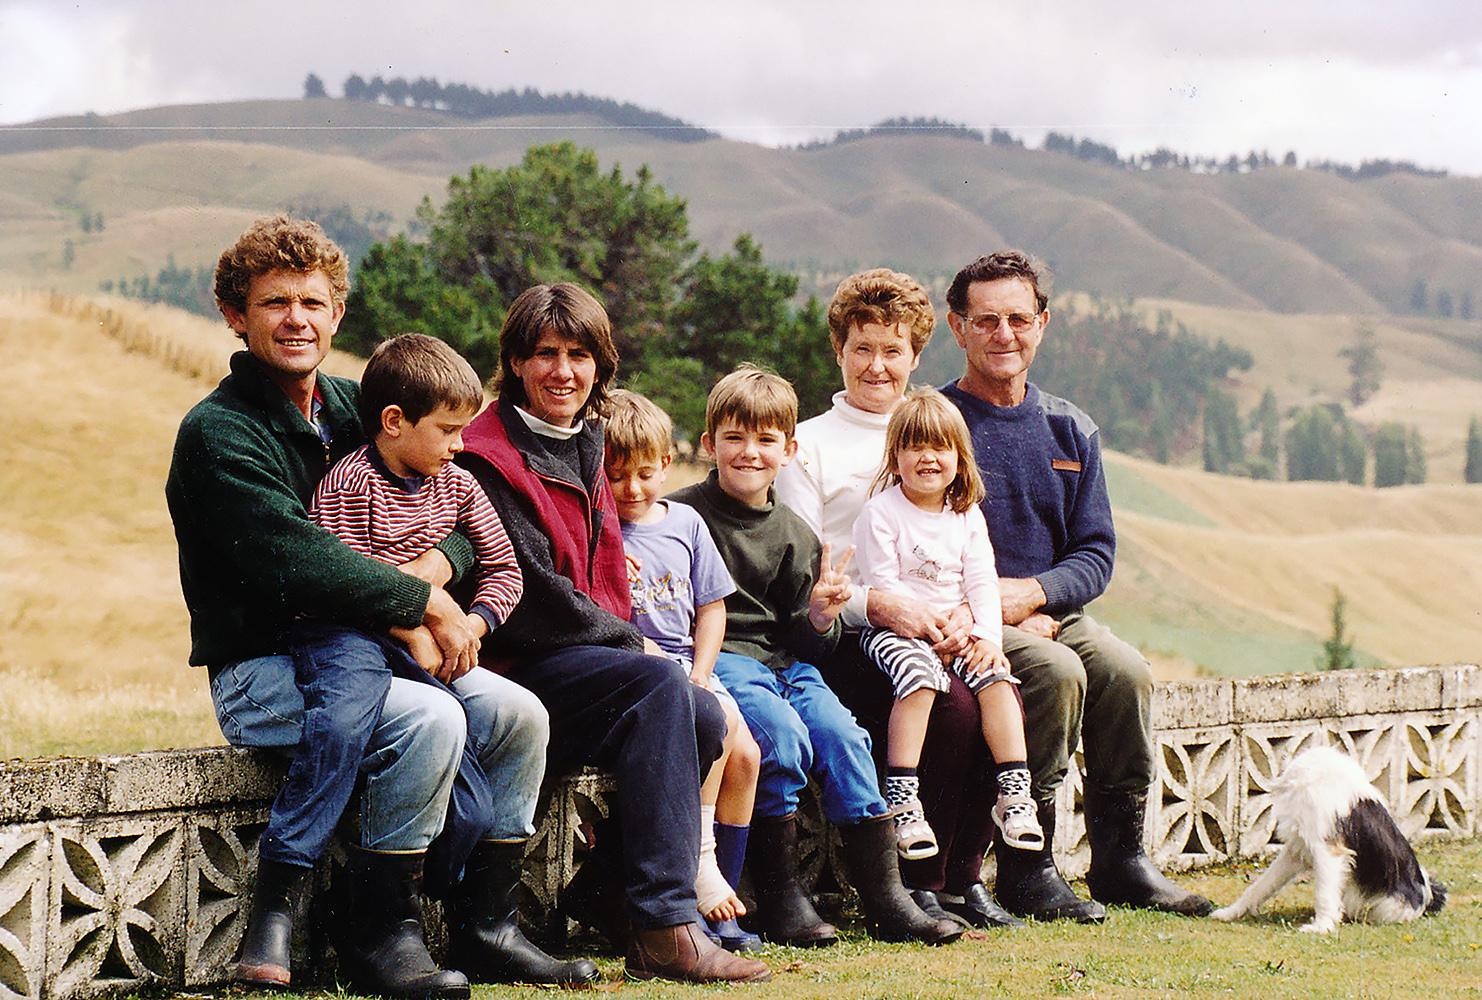 Chris, Glen, Jennifer, Gerard, Hugh, Annette, Allie, Fred Chesterman and Kenny (dog), - circa 2004.